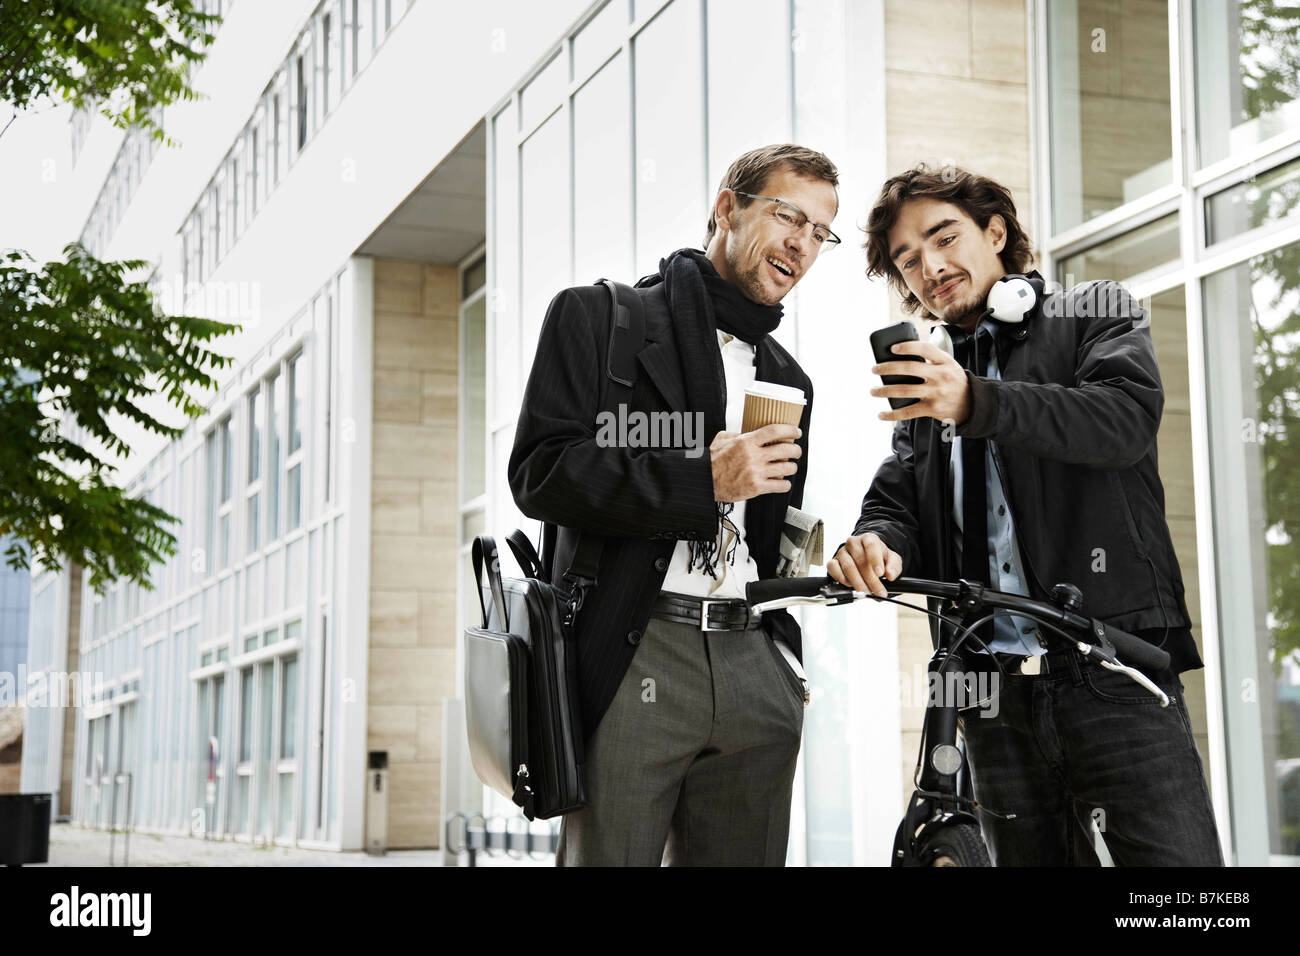 Men next to bicycle, coffee break - Stock Image